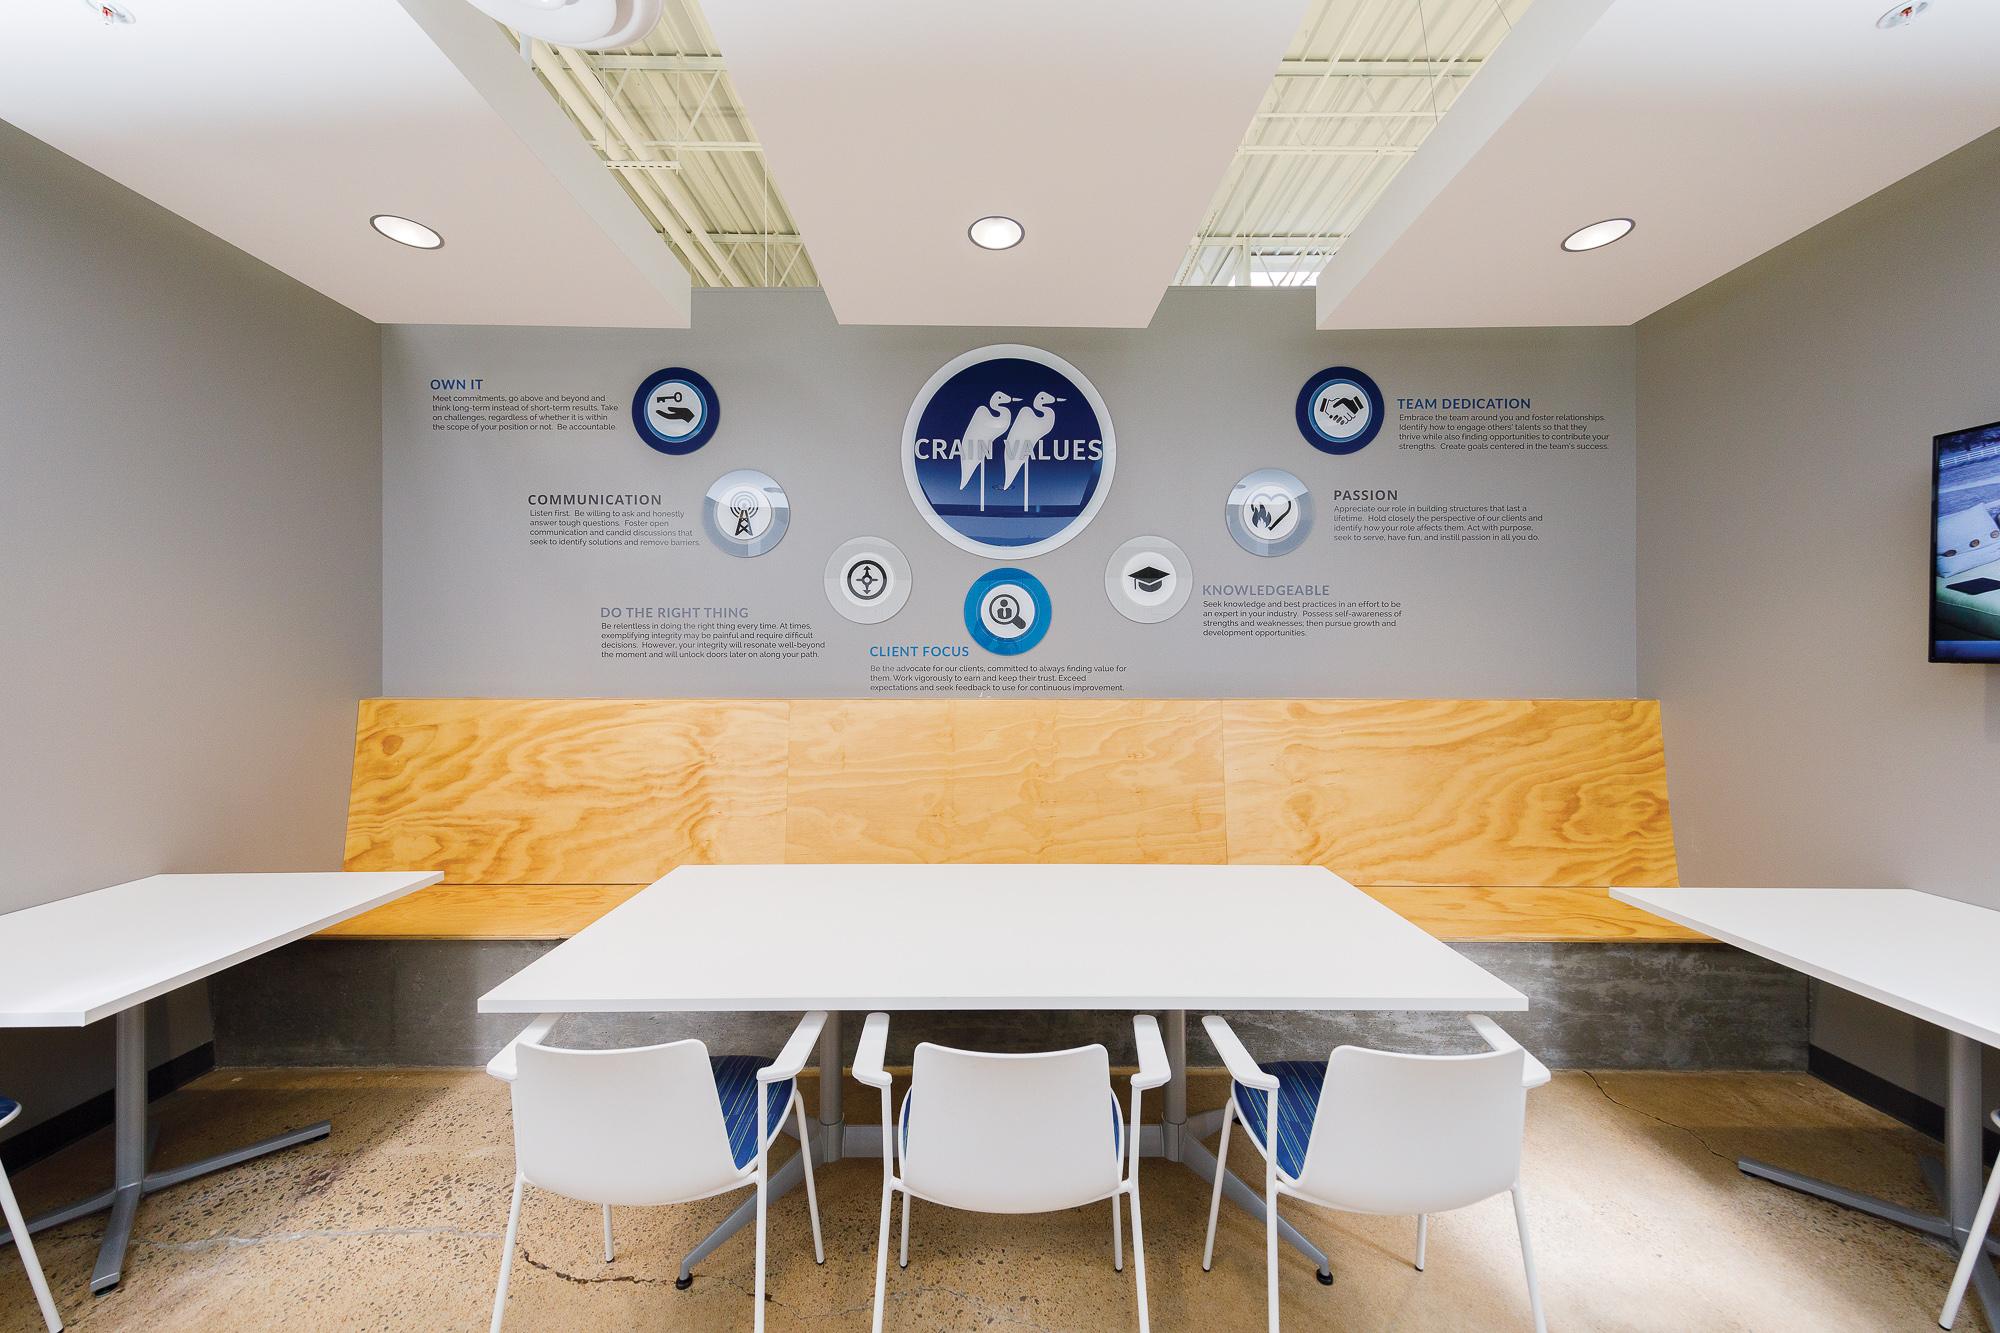 Company values - dimensional break room display